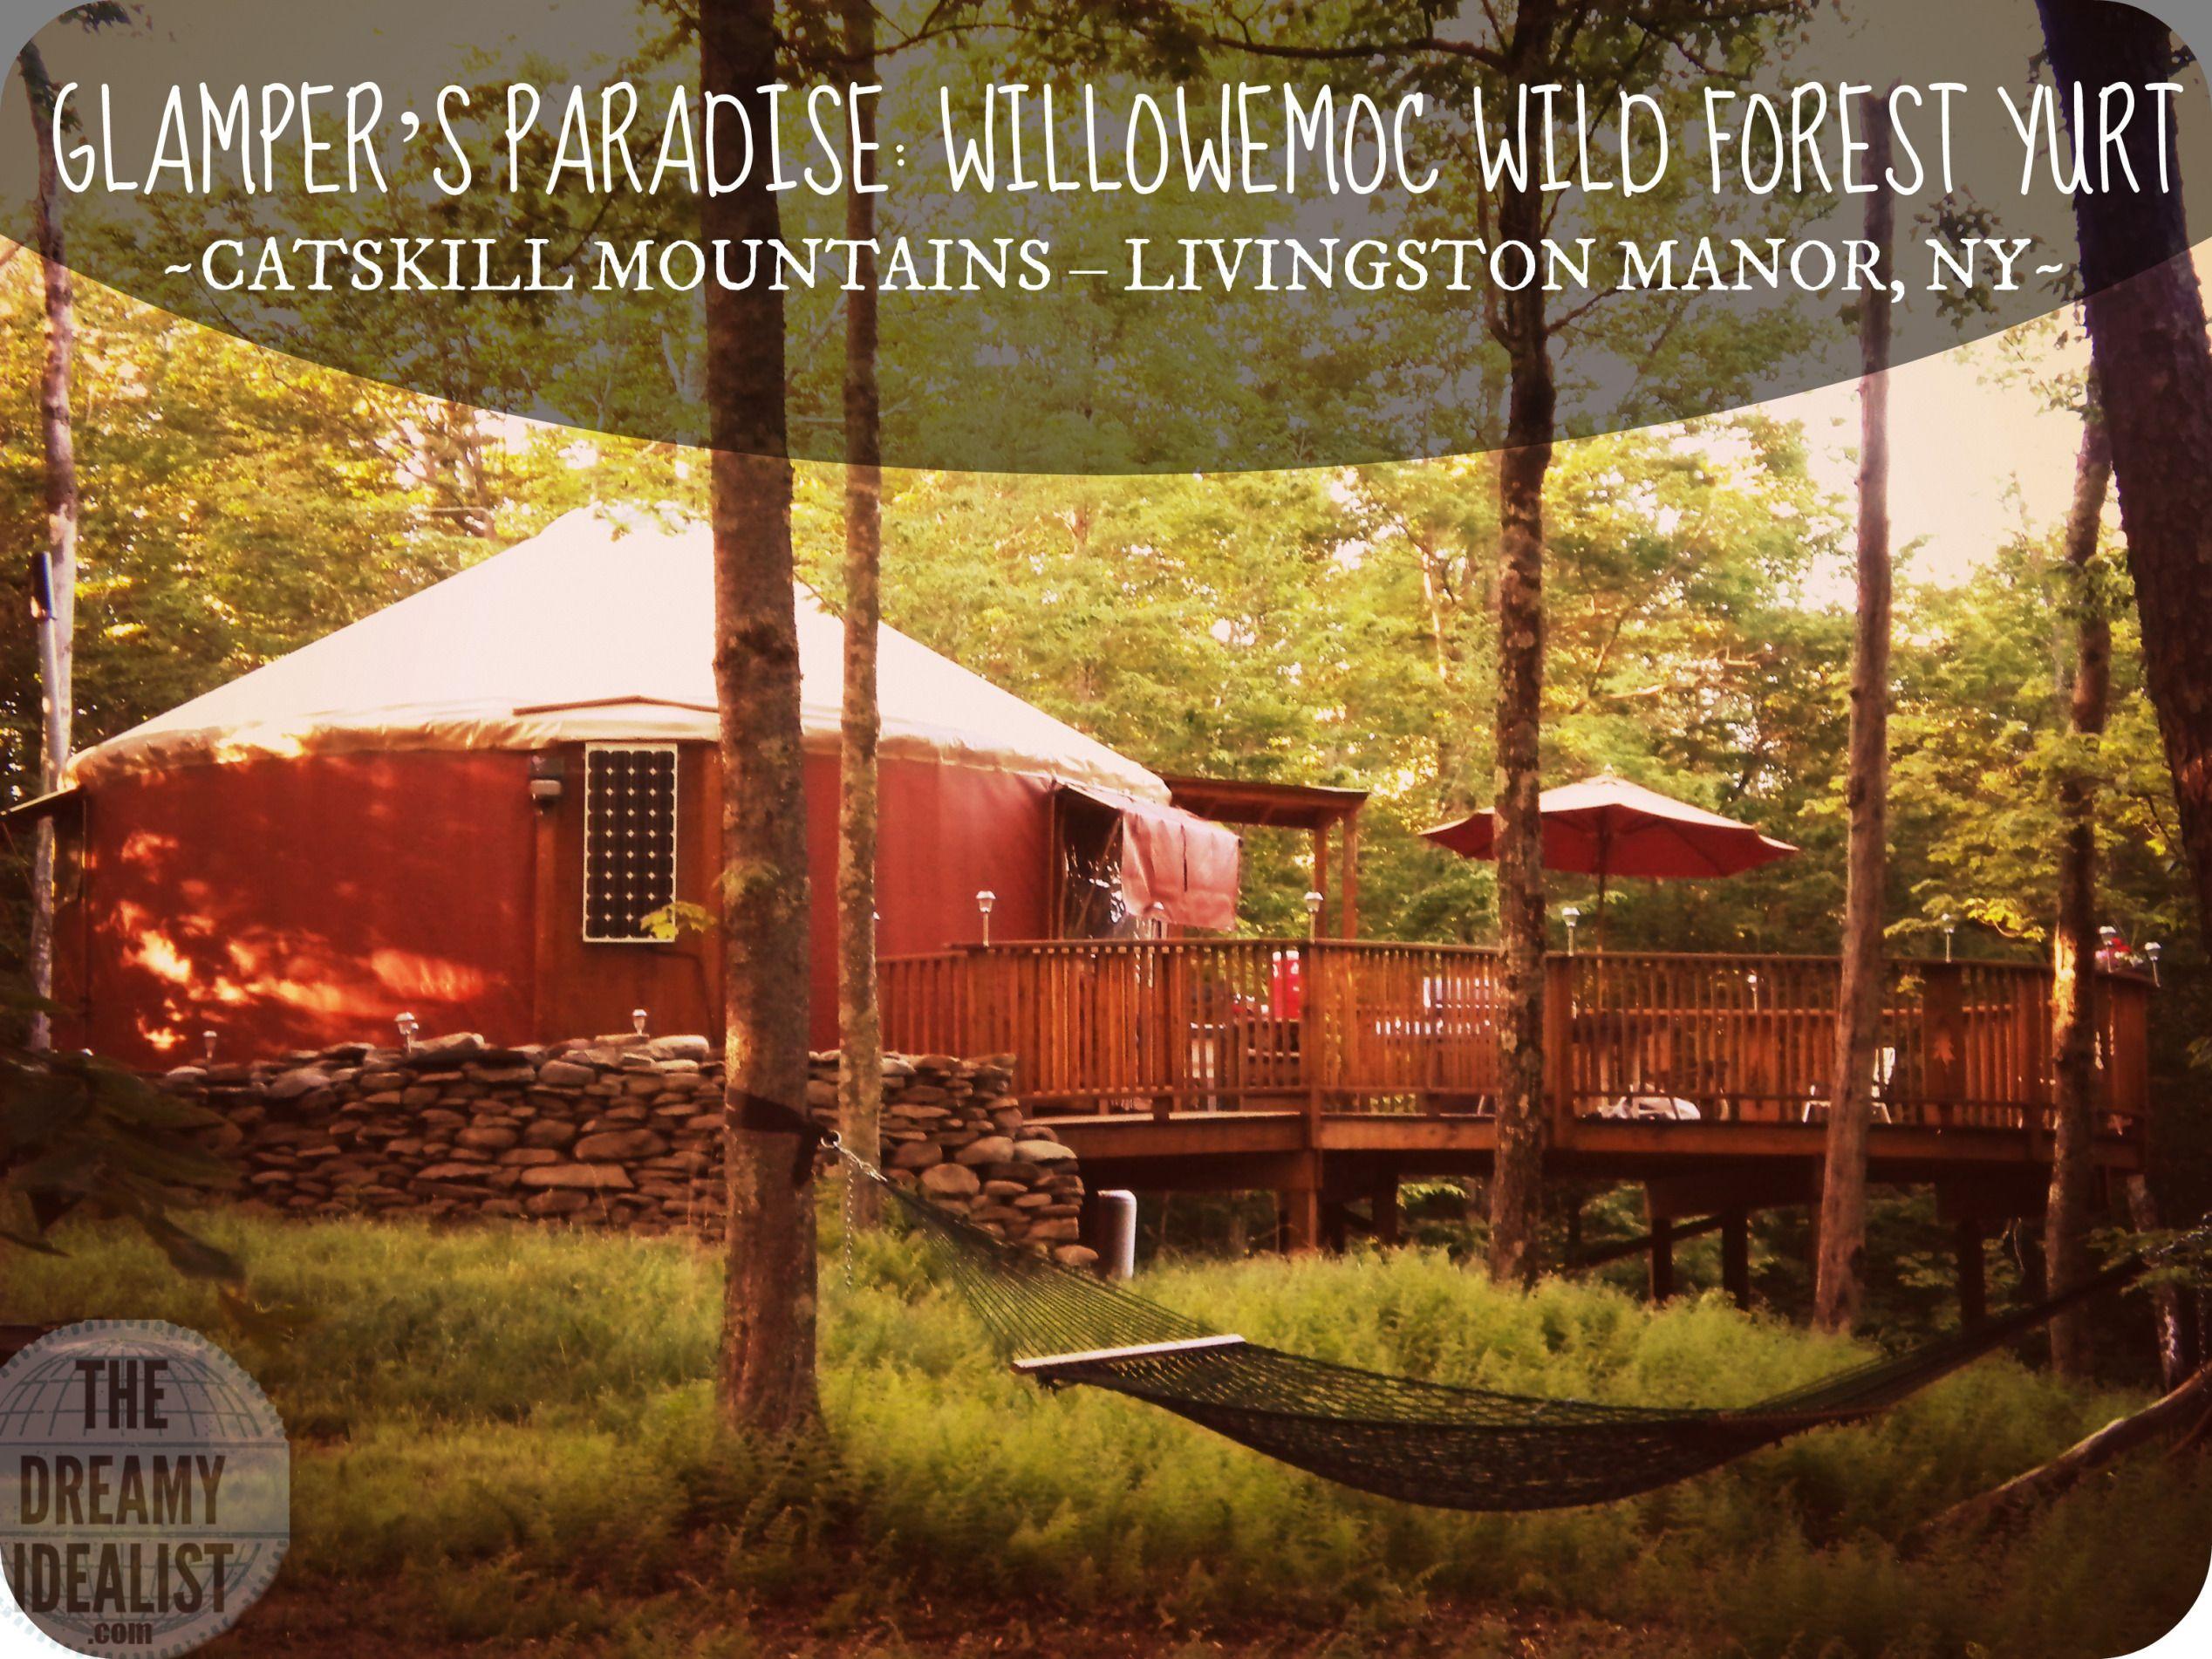 WILLOWEMOC WILD FOREST YURT - LIVINGSTON MANOR, NY